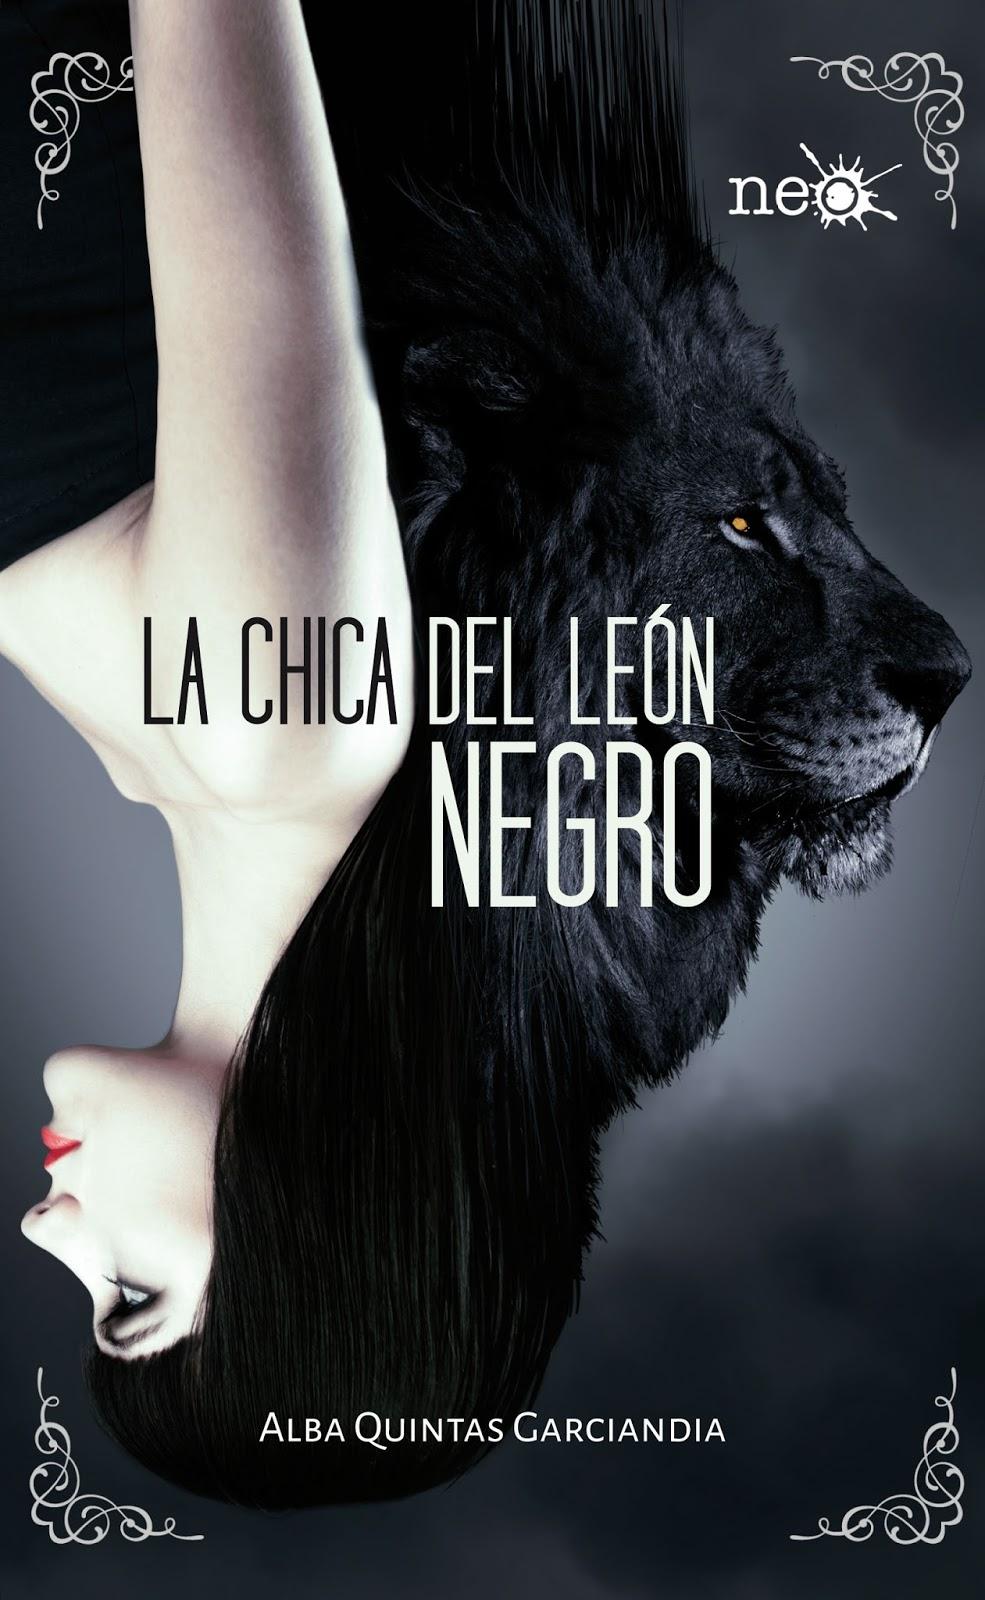 http://labibliotecadebella.blogspot.com.es/2015/11/la-chica-del-leon-negro-alba-quintas.html